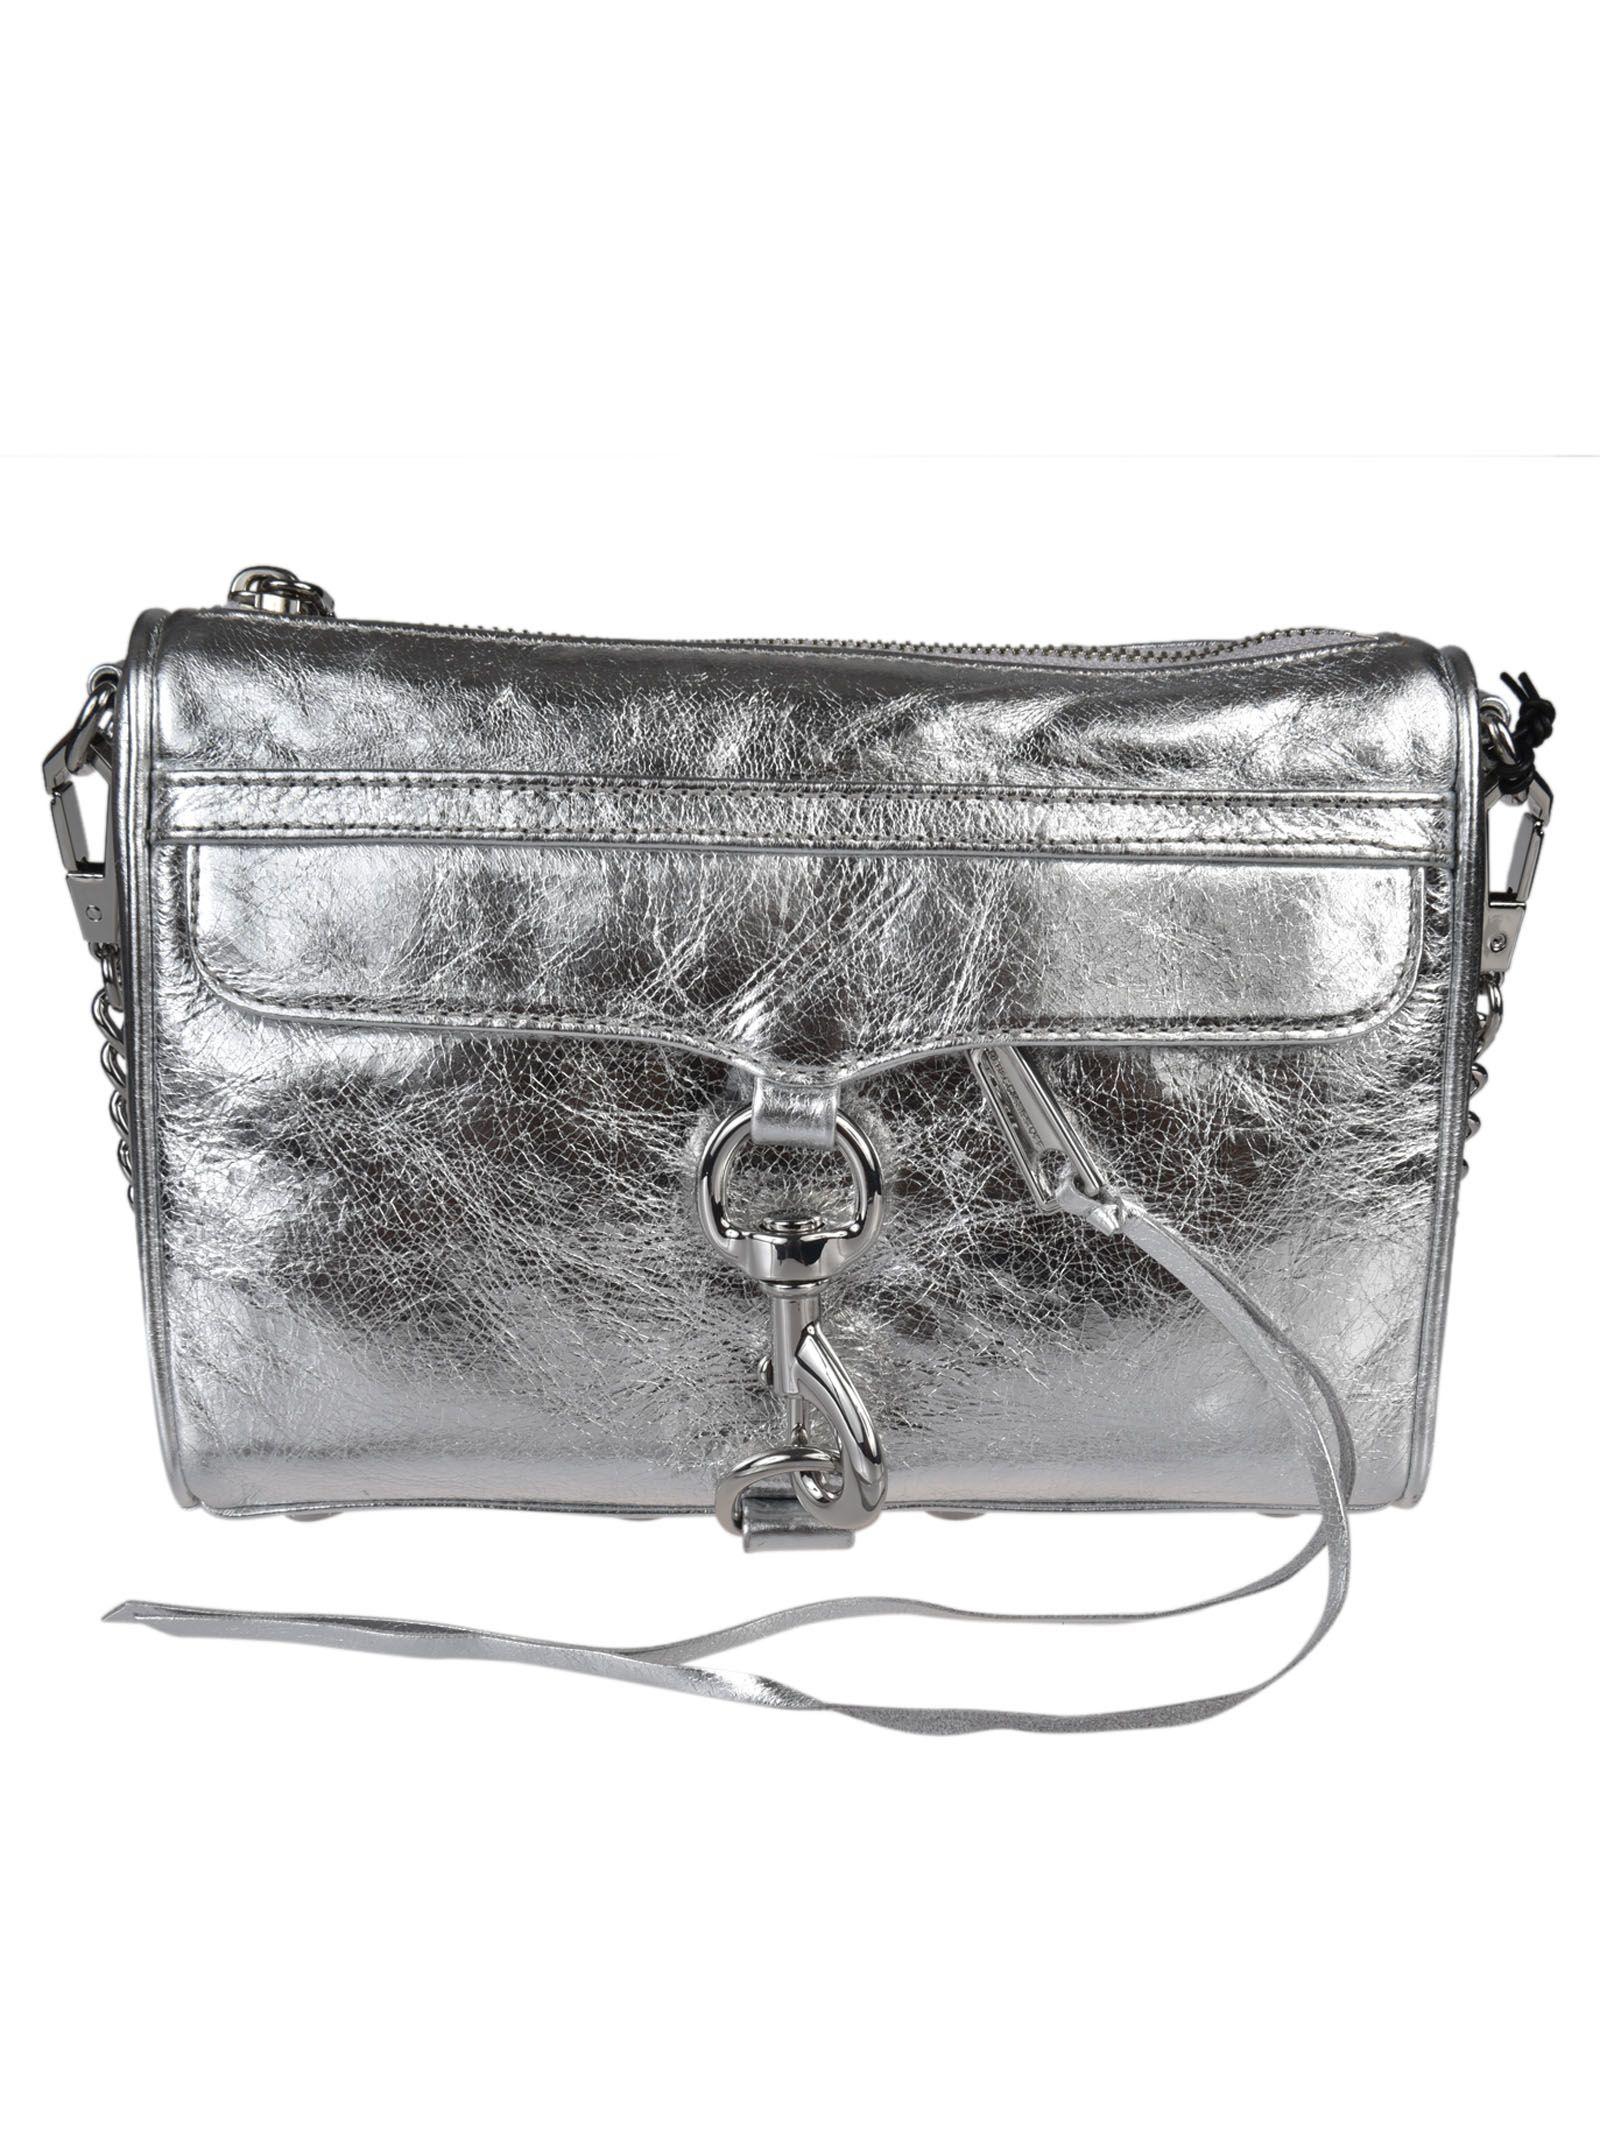 Rebecca Minkoff Mini Mac Distressed Shoulder Bag